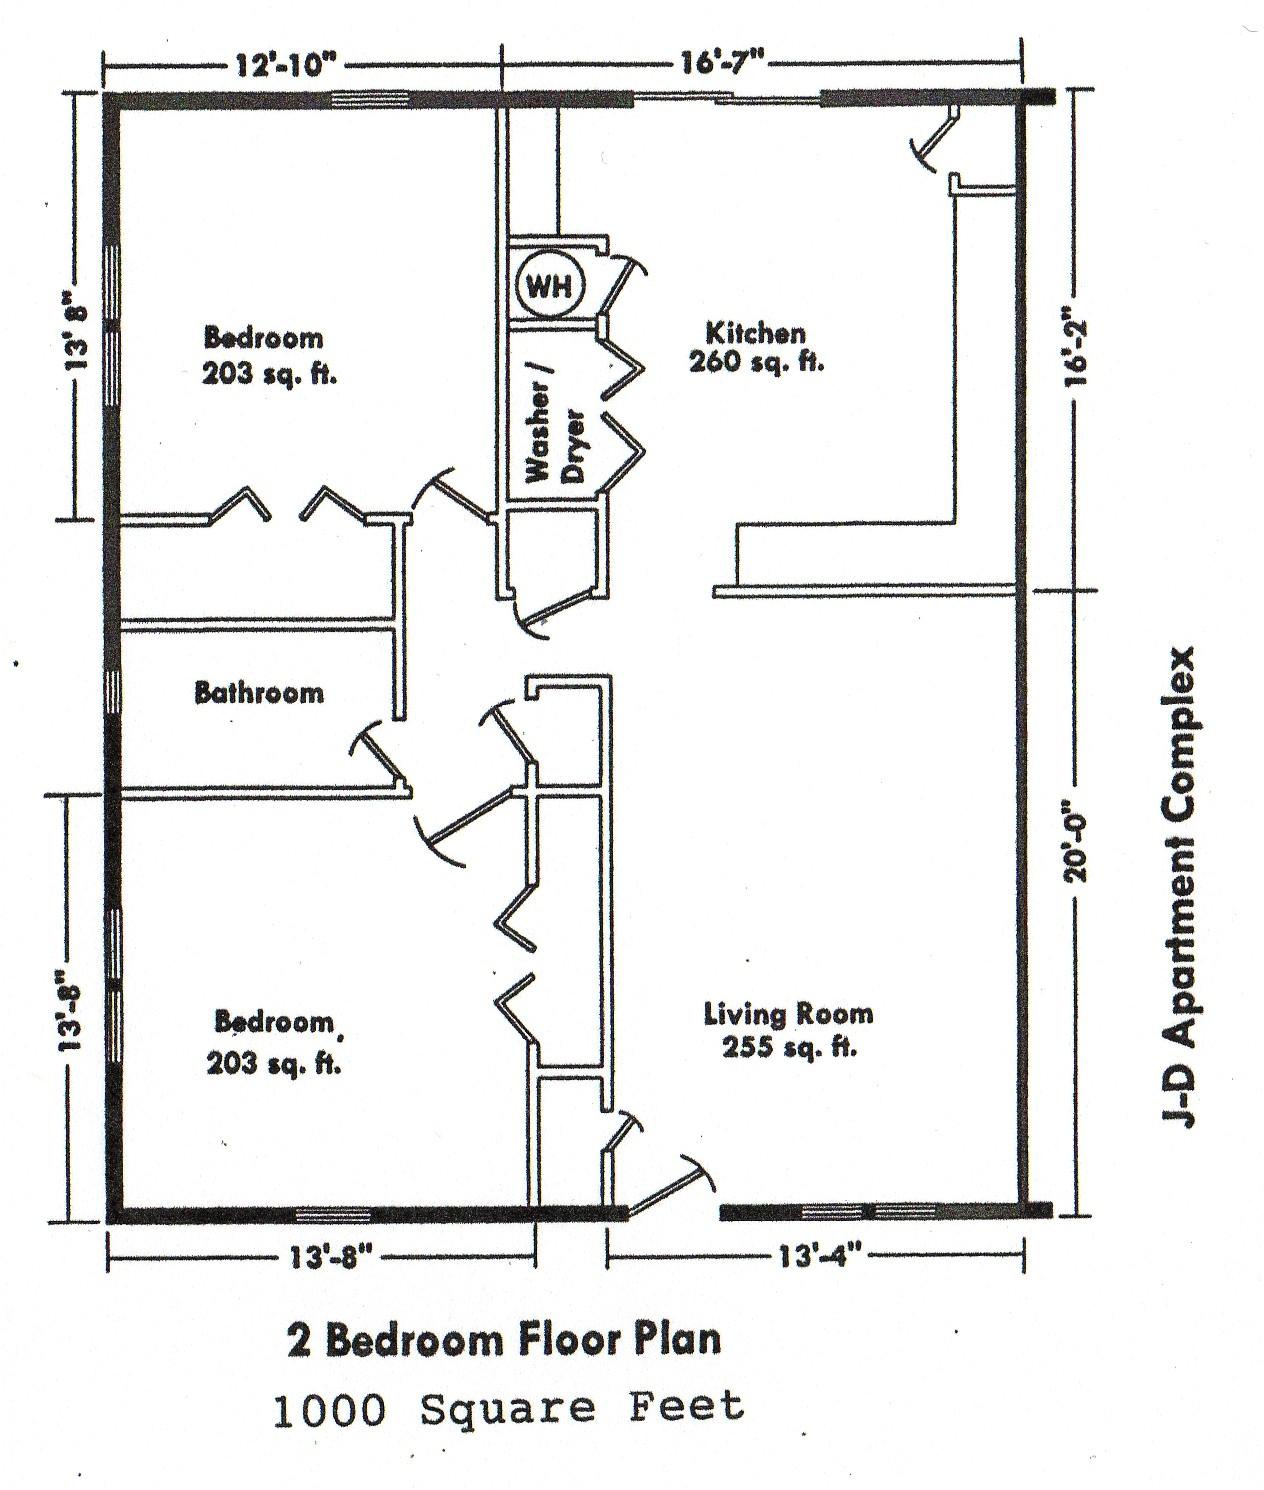 Floor Plans for 2 Bedroom Homes Modular Home Modular Homes 2 Bedroom Floor Plans